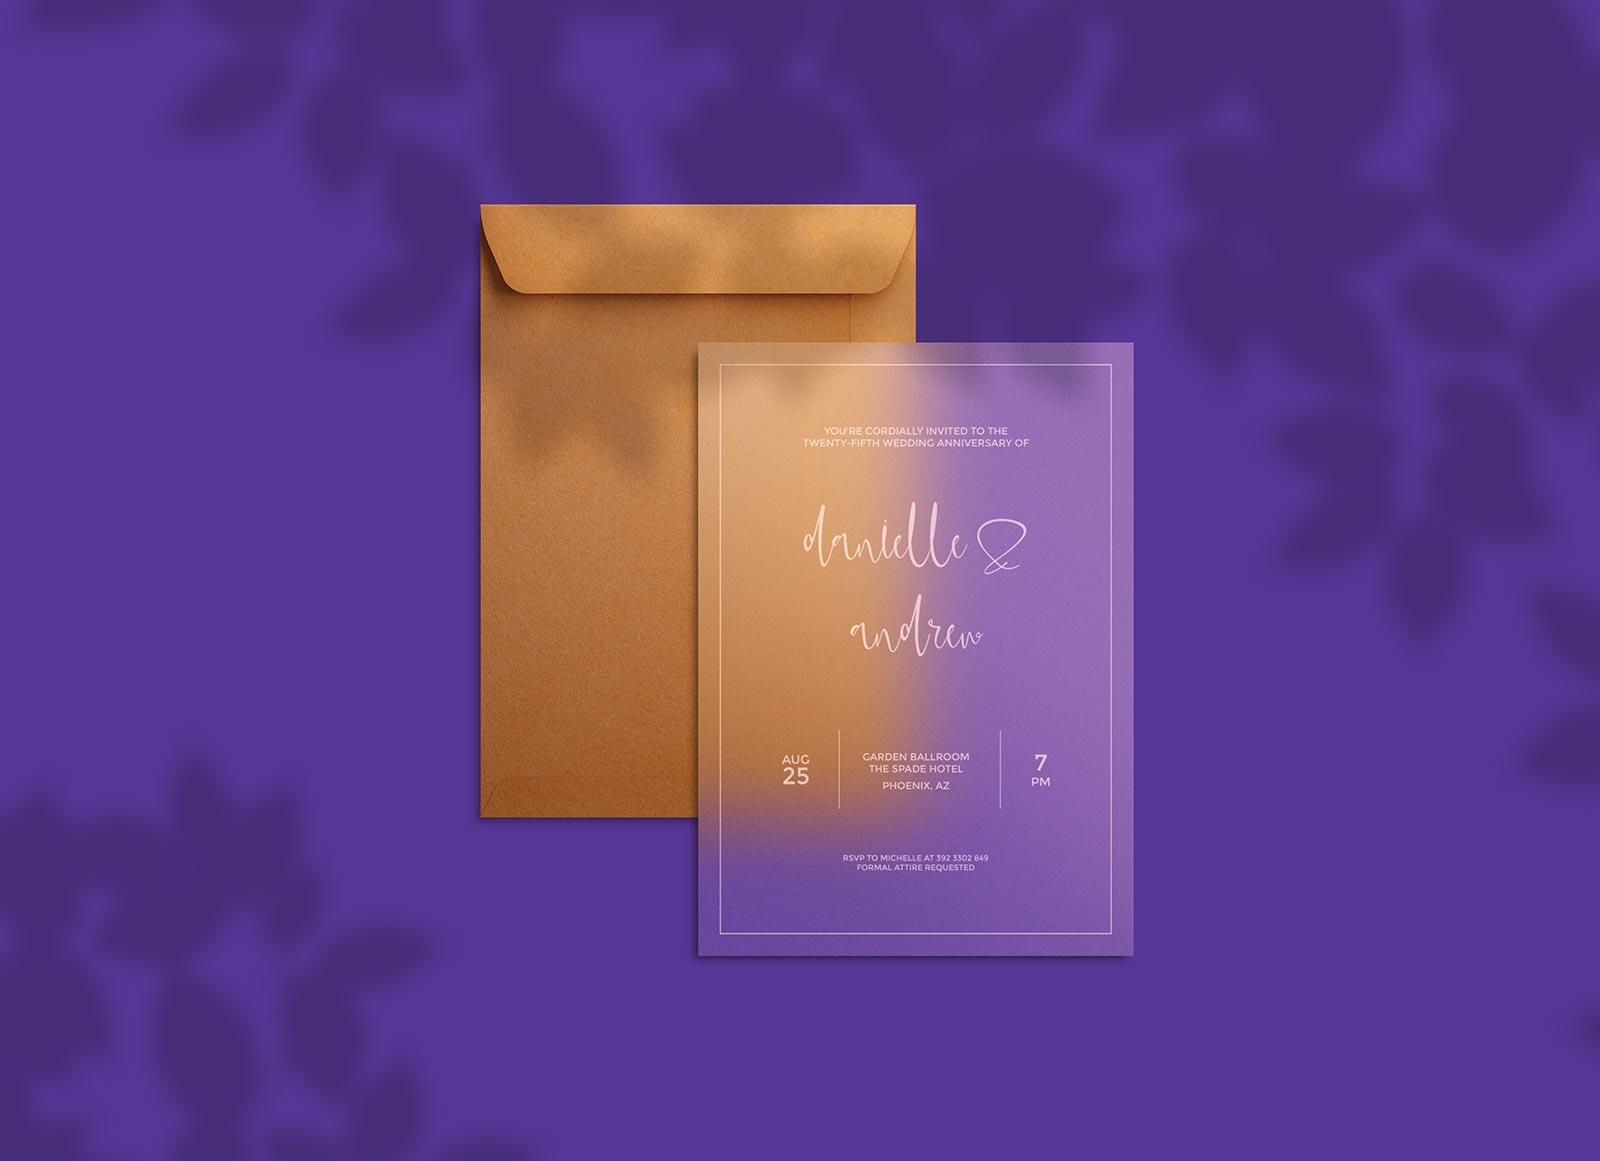 Free-Translucent-Invitation-Card-With-Envelop-Mockup-PSD